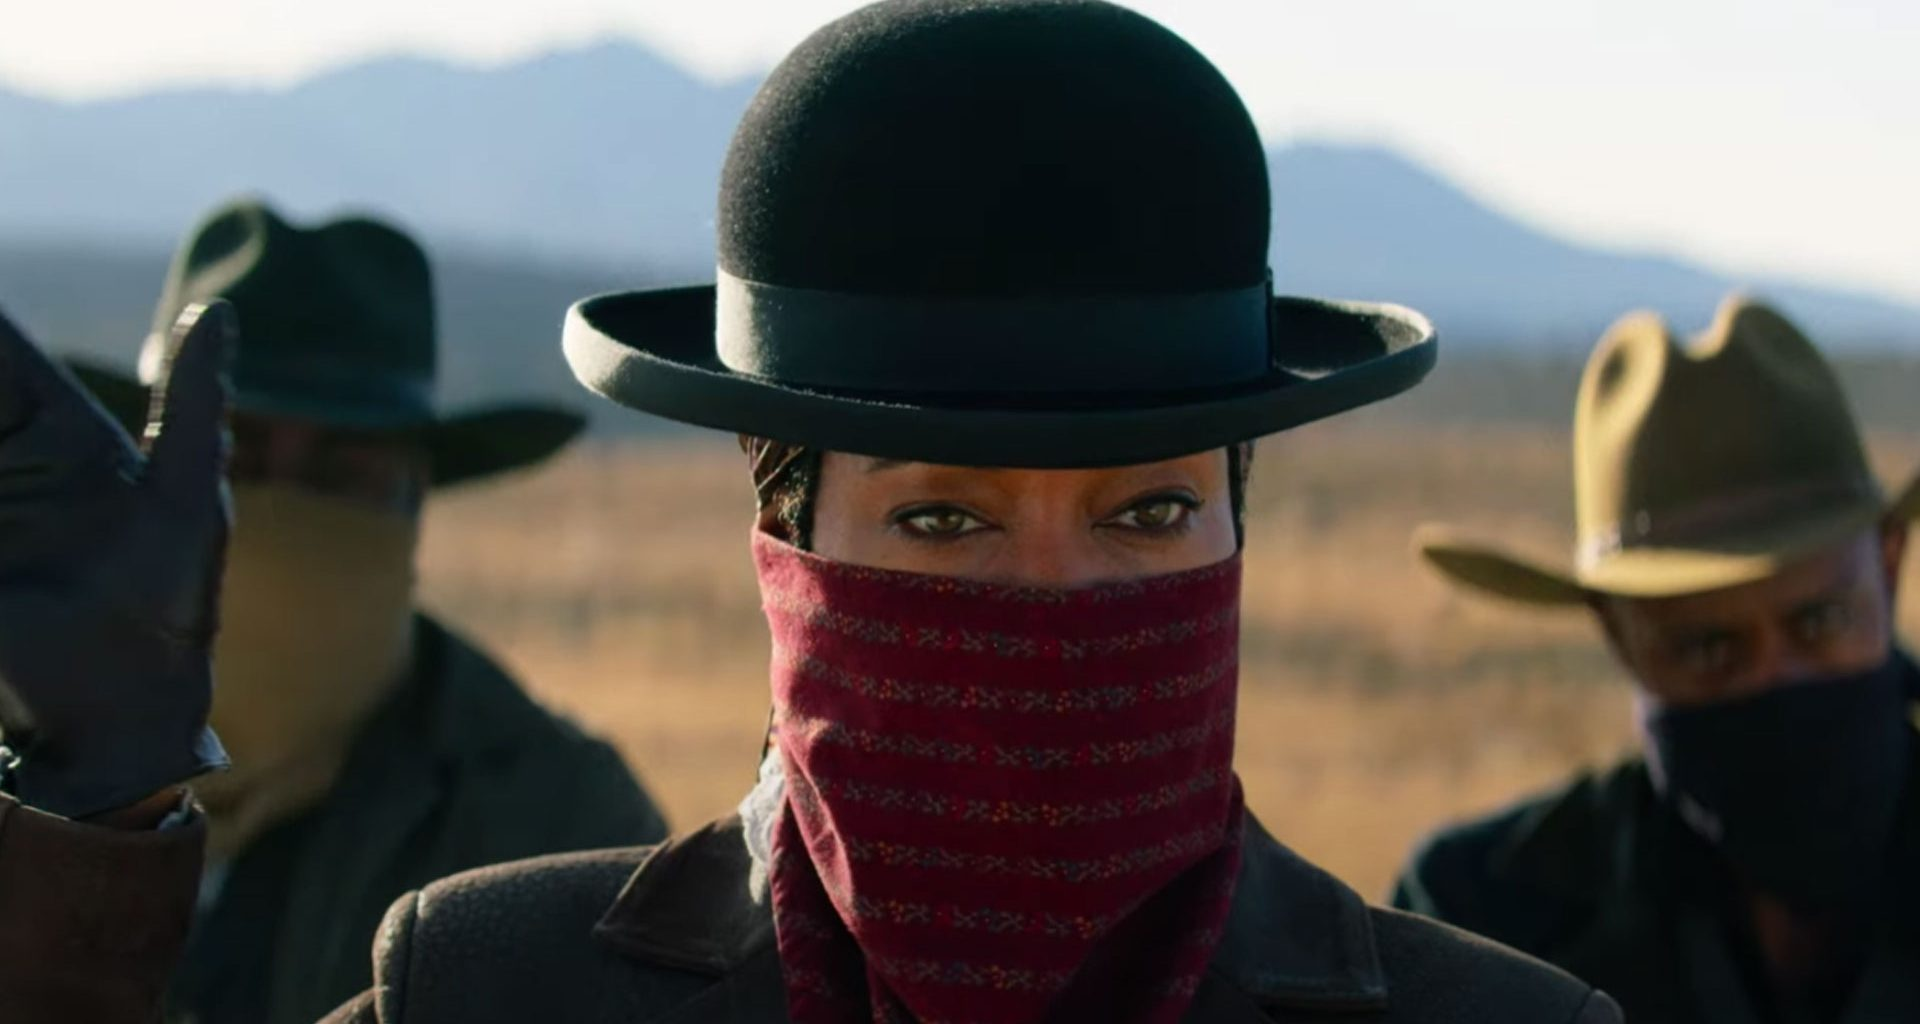 Vingança Castigo Idris Elba Filme Netflix CDL 1920x1080 01